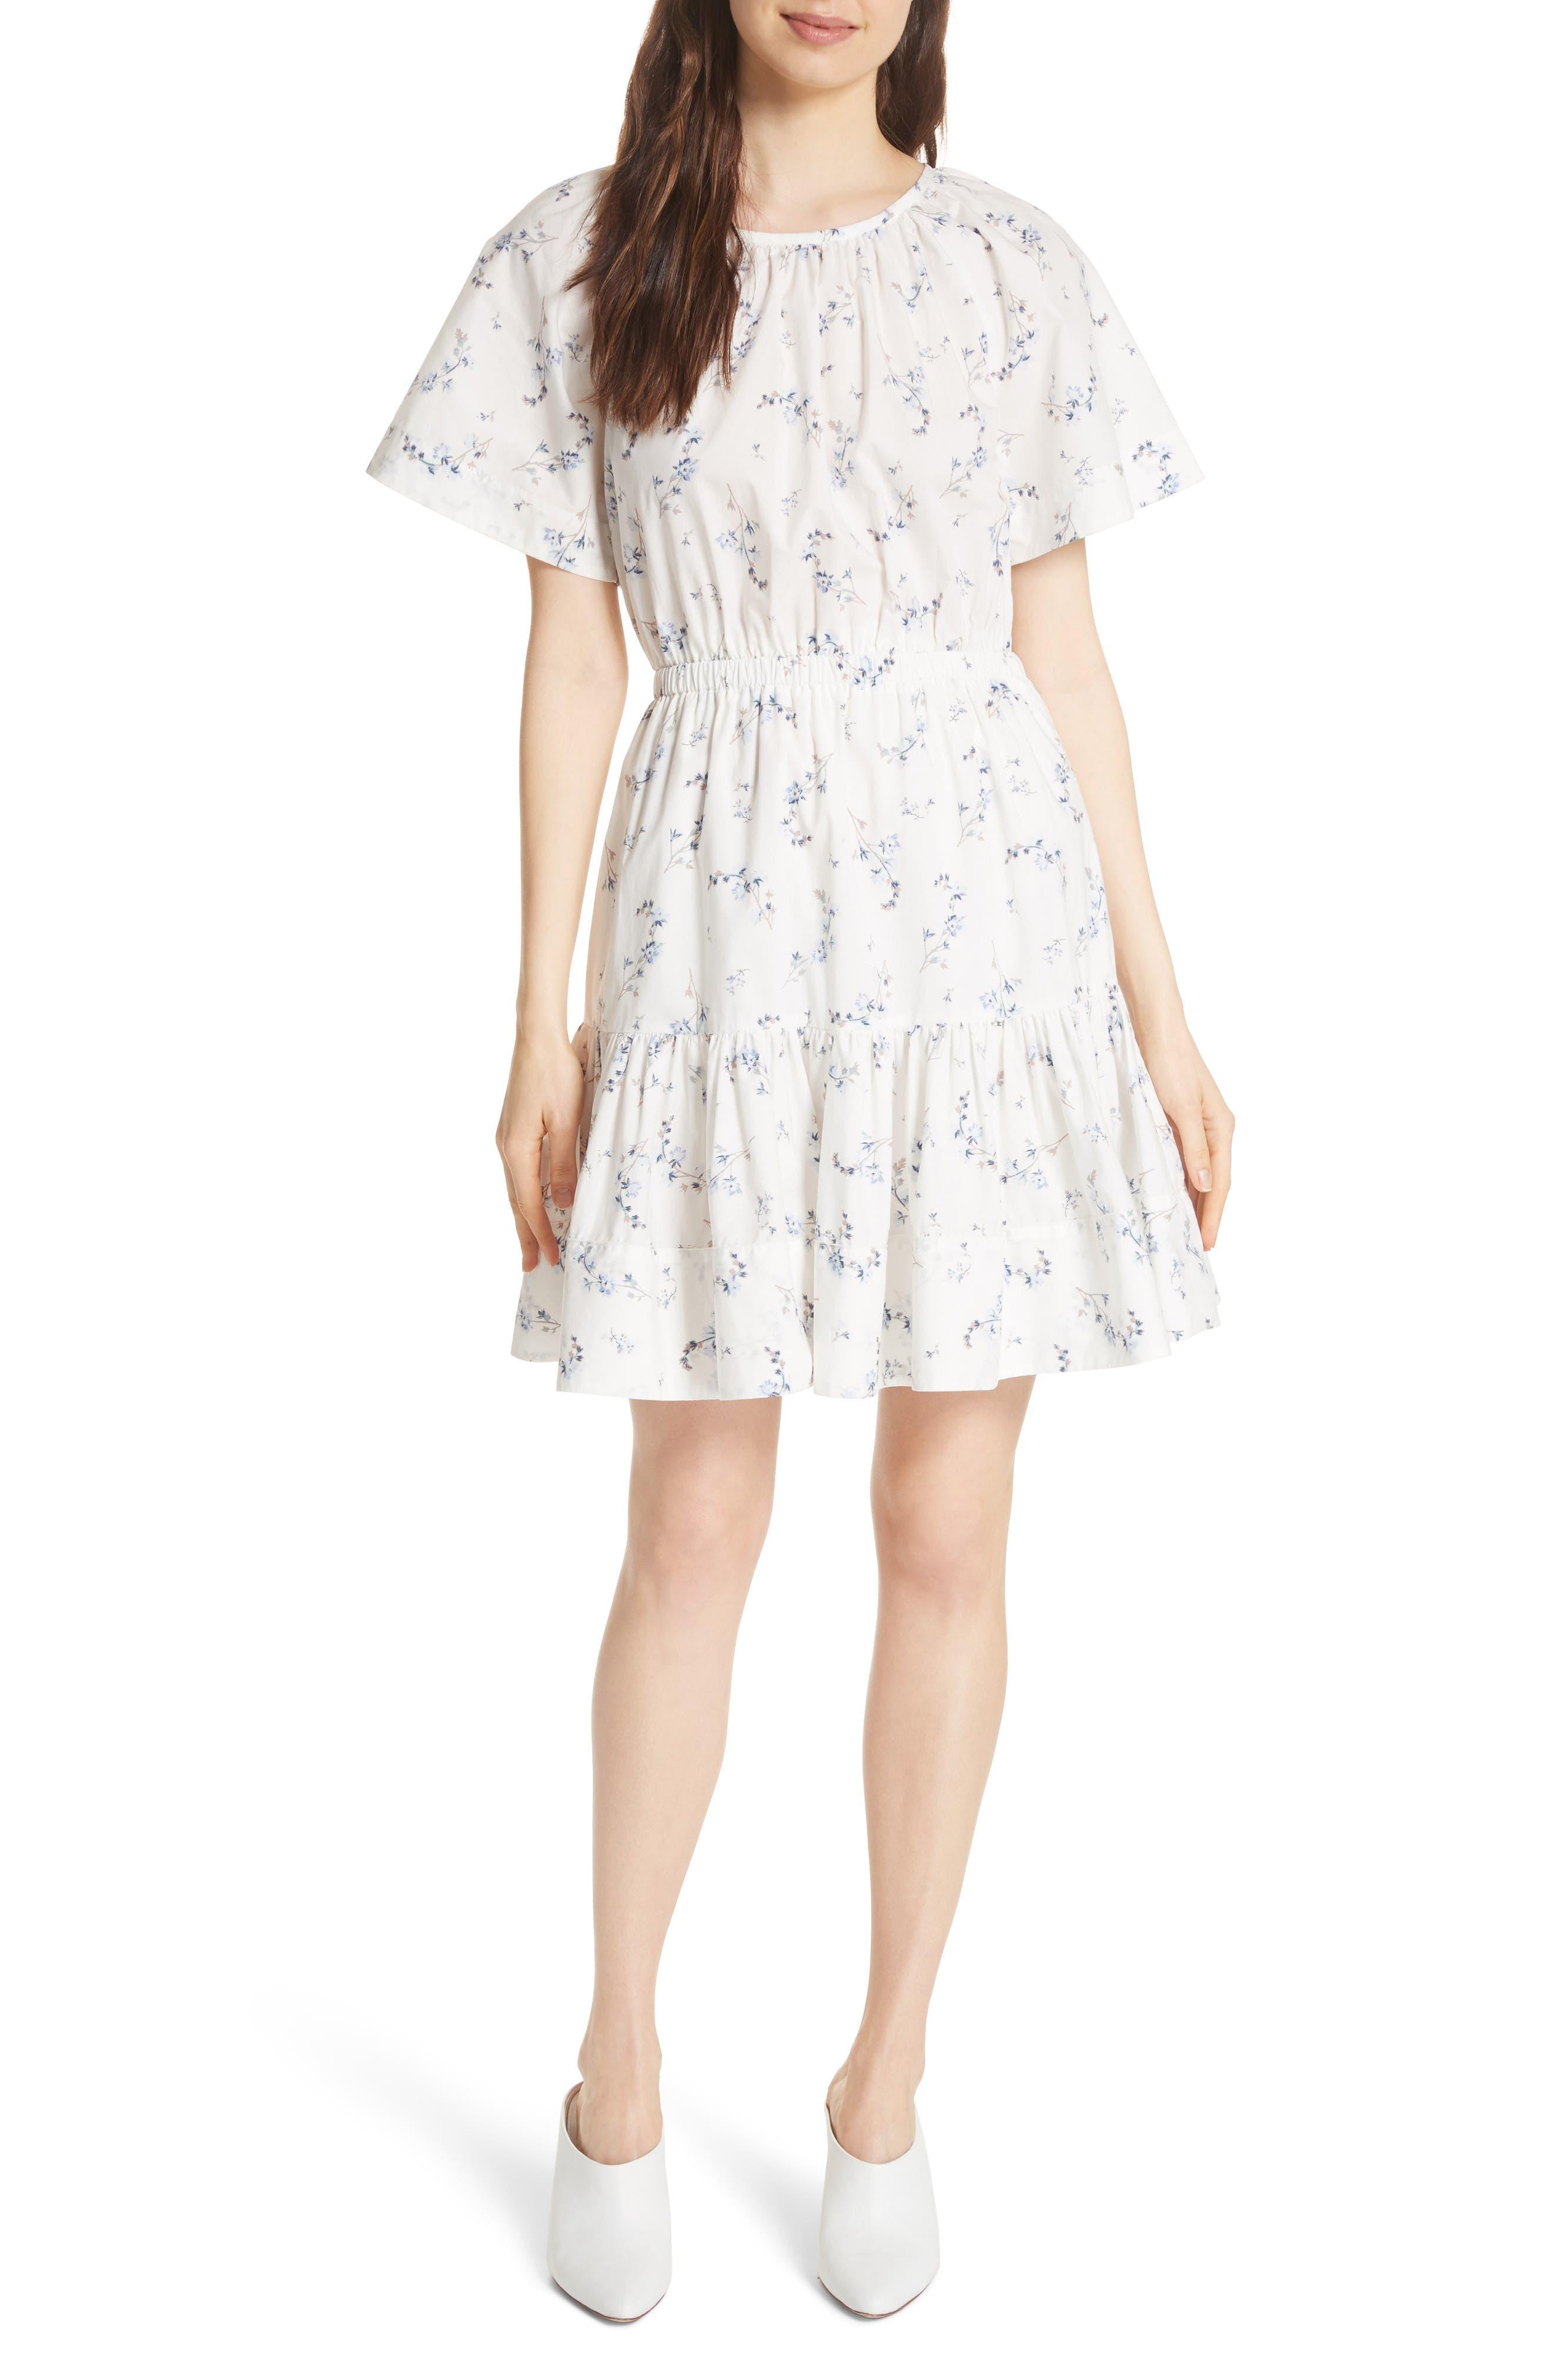 Francine Back Cutout Mini Dress,                             Main thumbnail 1, color,                             103